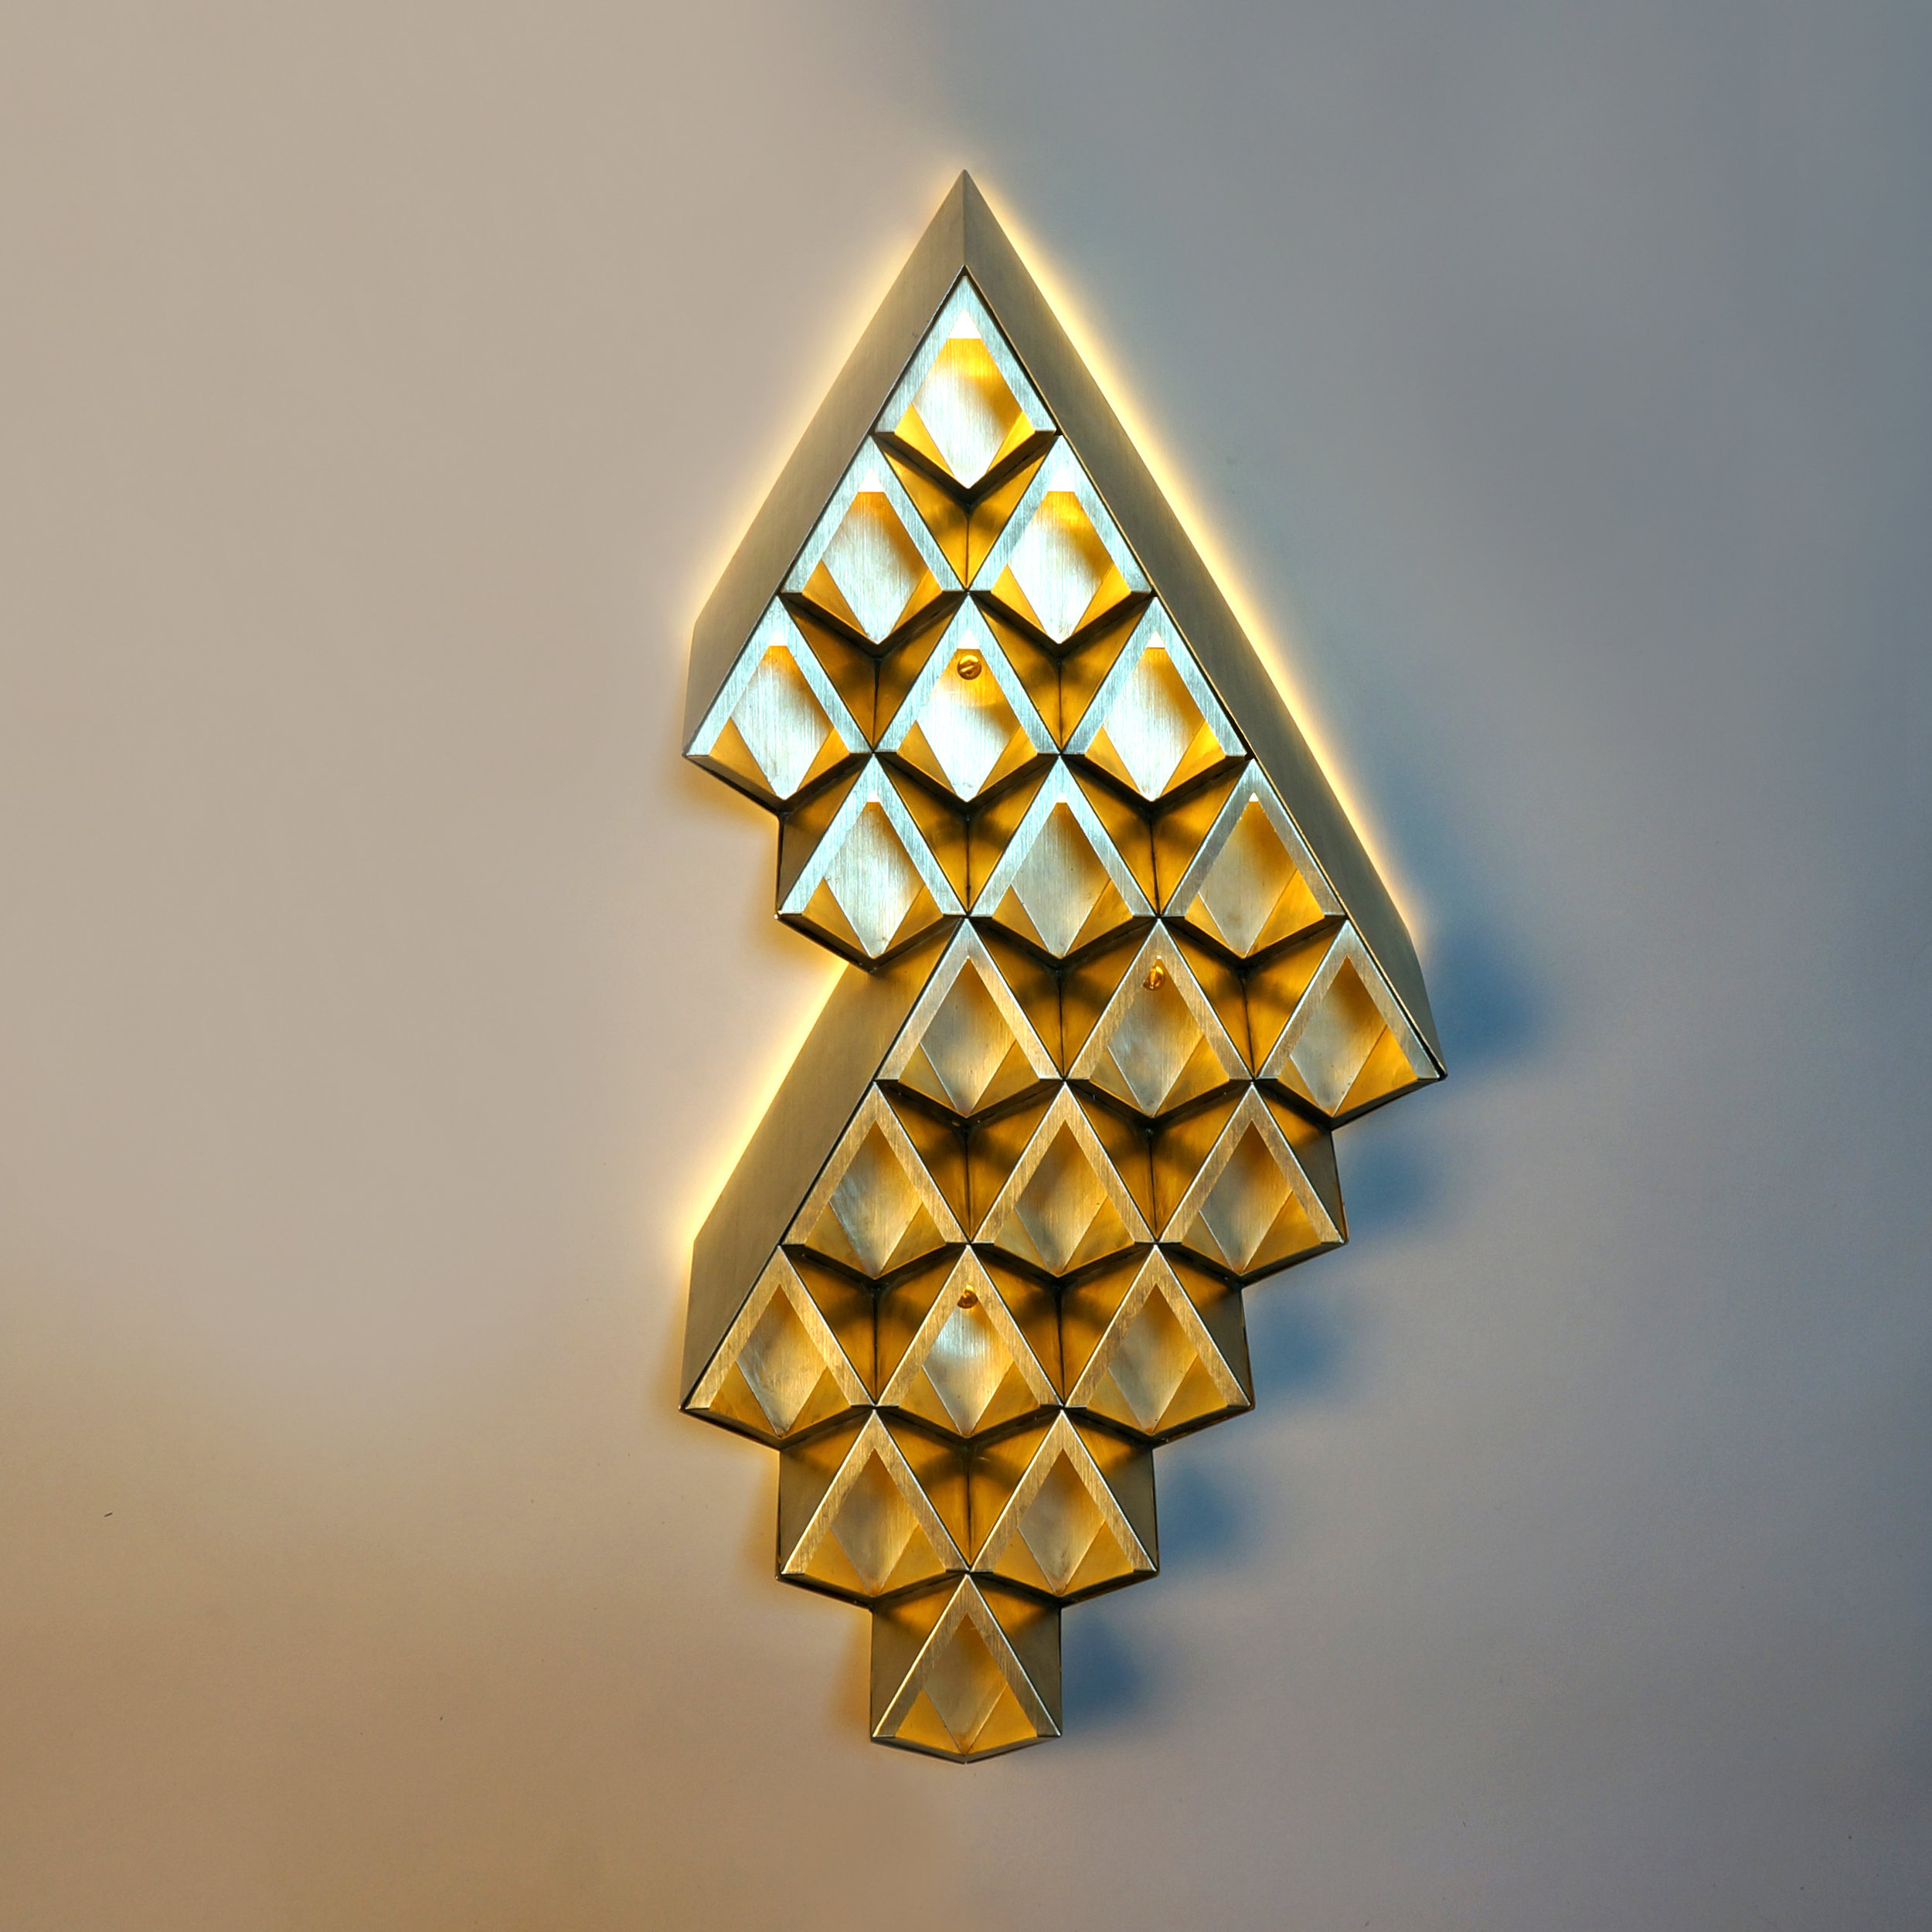 Medium Diamond_Light On_Square.jpg